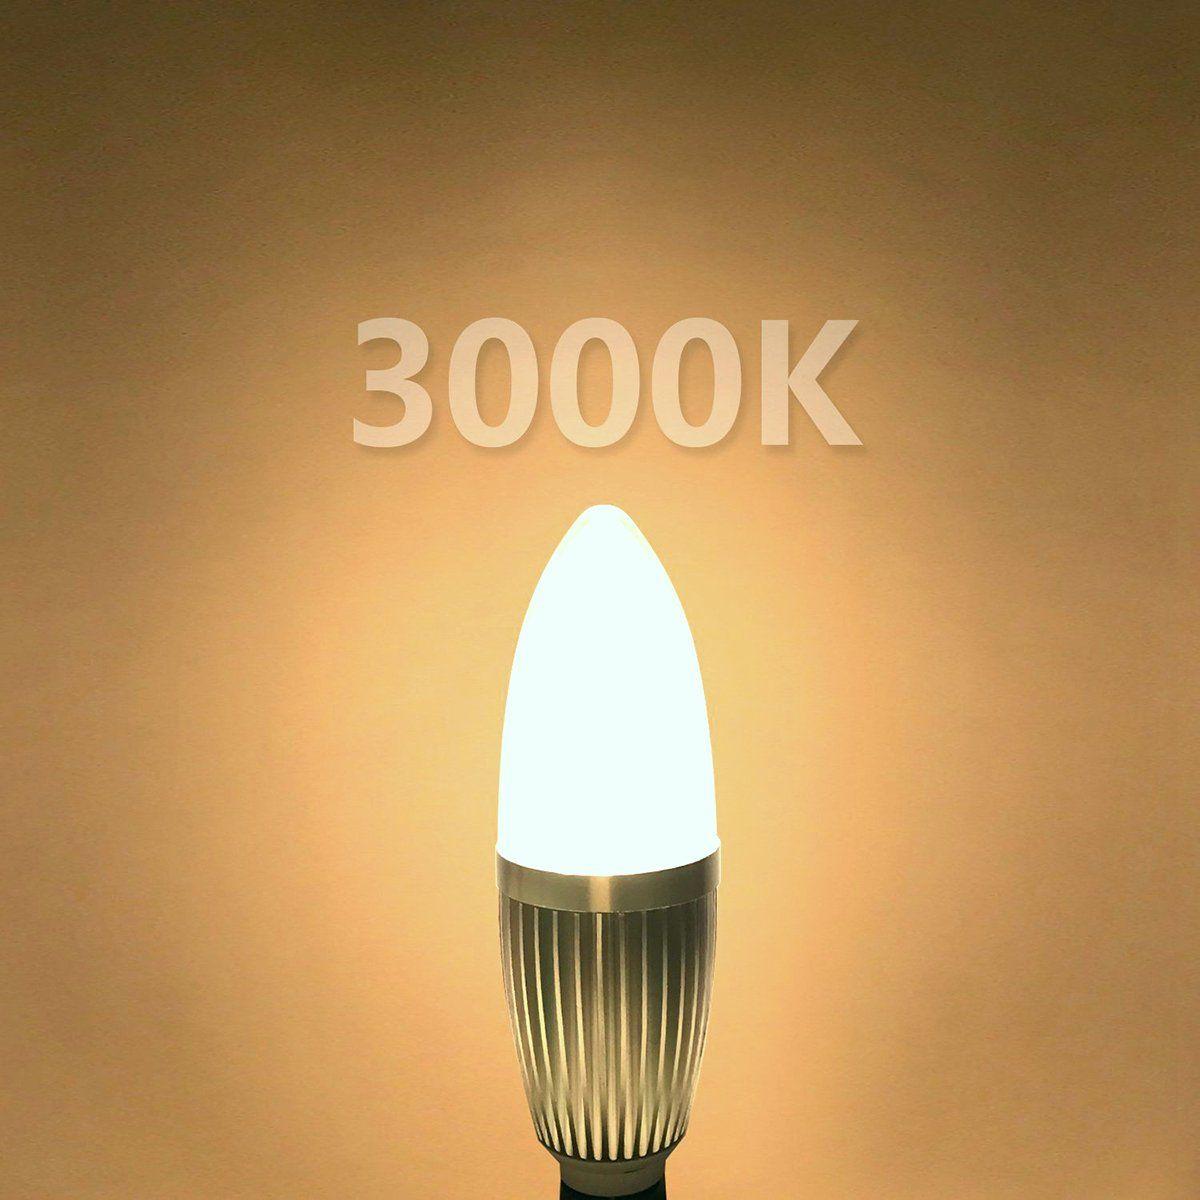 3 Pcs Pack E12 Led Candelabra Bulb 12w Led Candle Light Bulbs 100 Watt Light Bulbs Equivalent1200 Lumens N Light Bulb Candle Led Candelabra Bulbs Dimmable Lamp